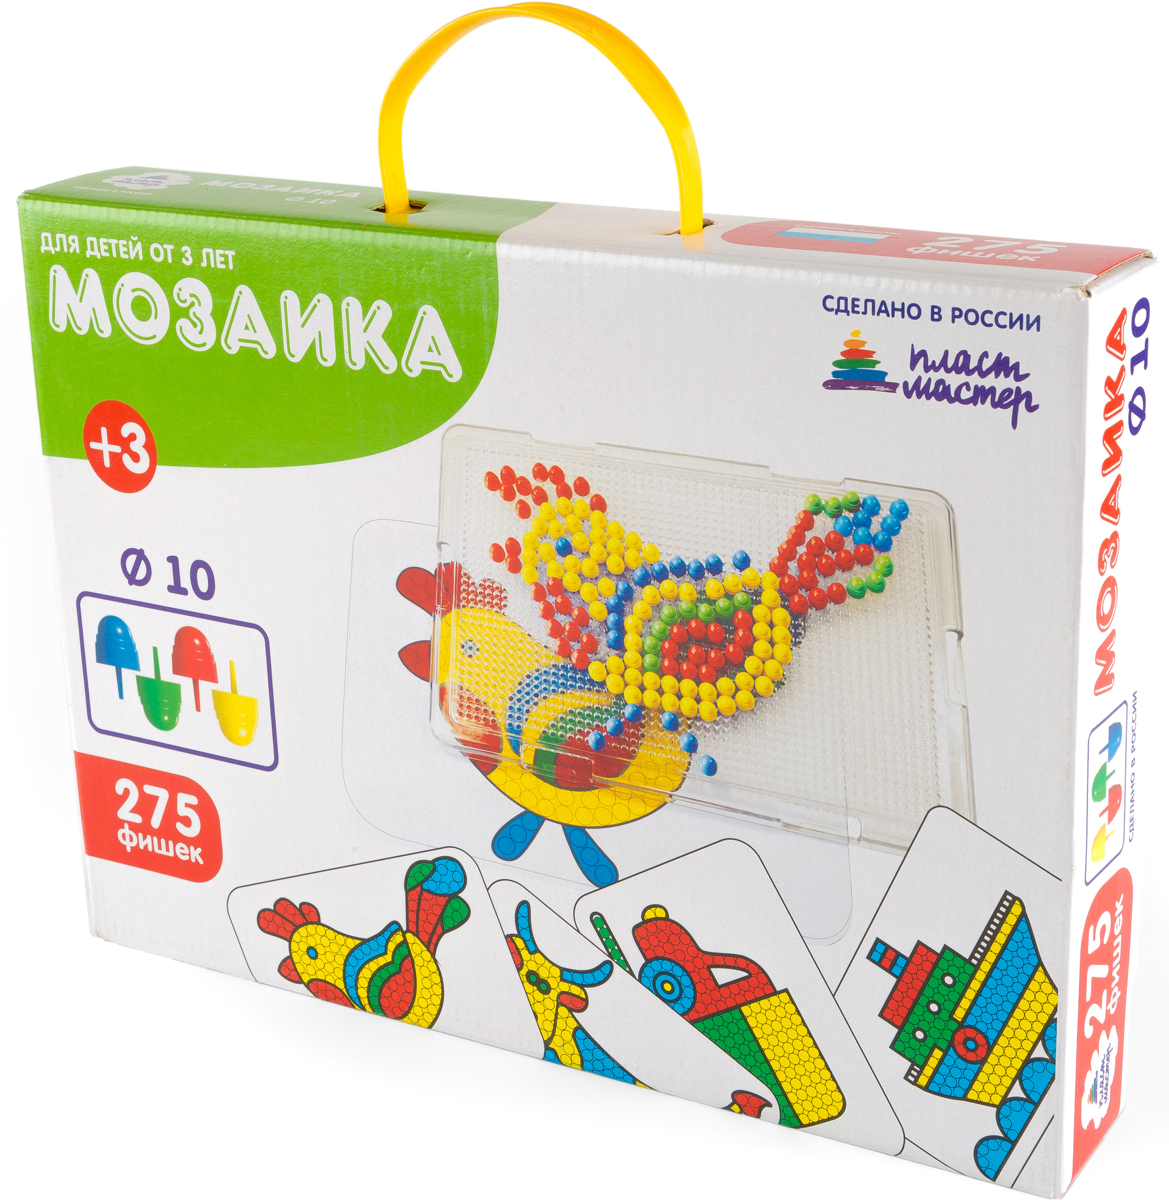 Пластмастер Мозаика с картинками d10 пластмастер напольная мозаика